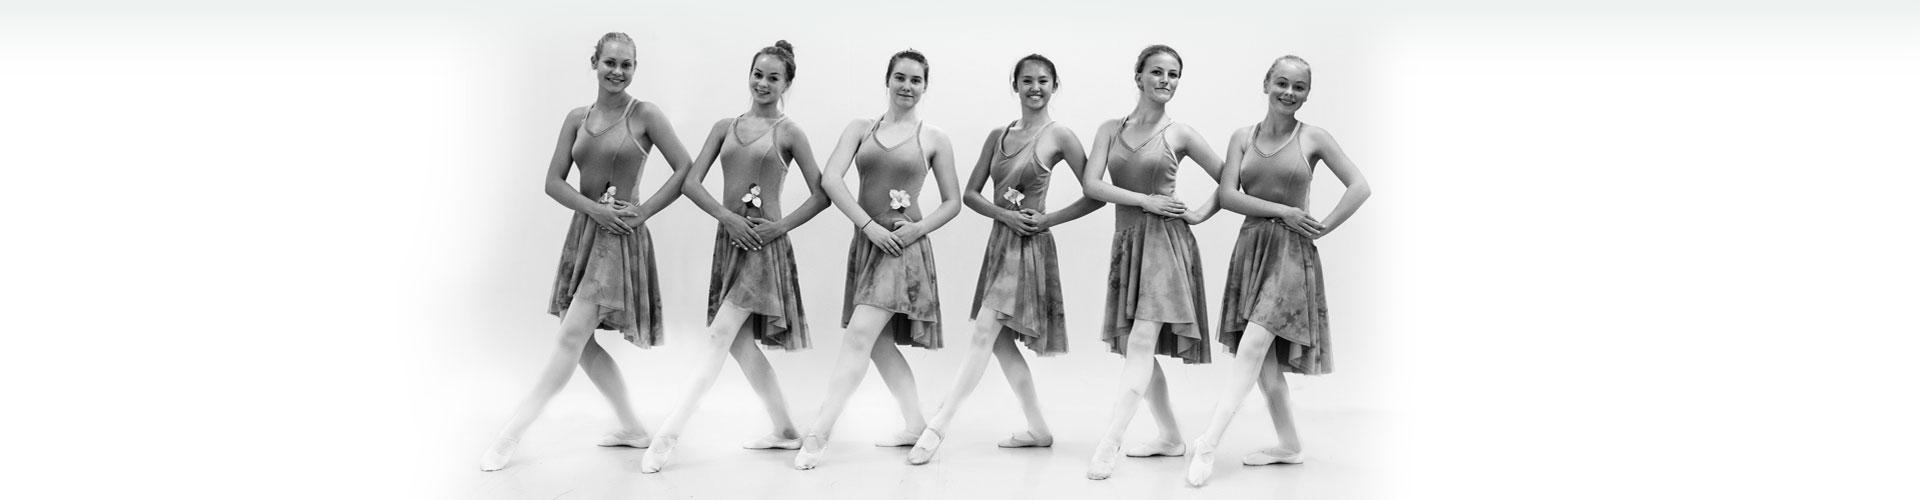 seks dansere